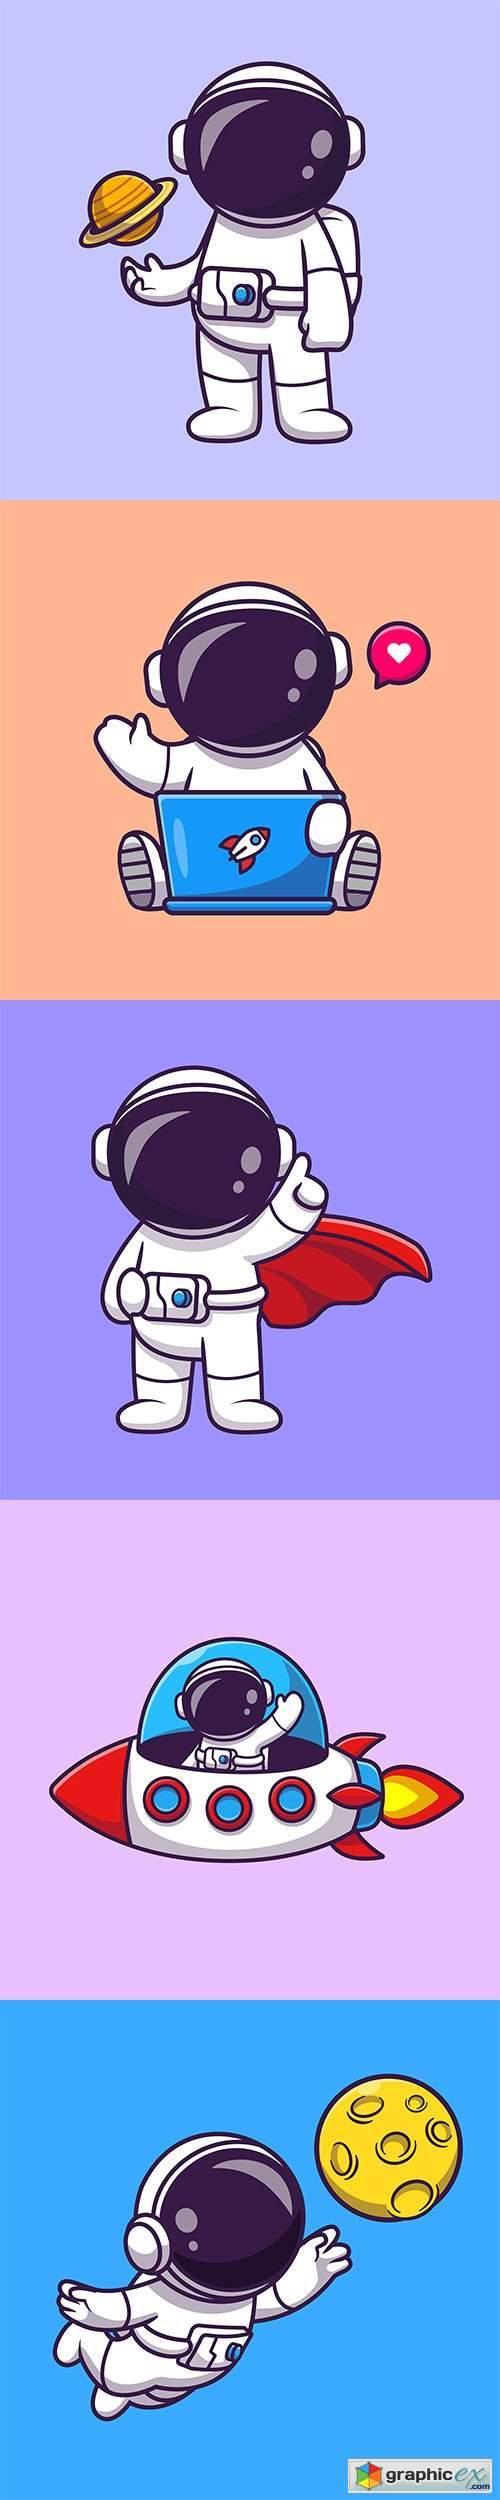 Cute astronaut catching moon cartoon vector illustrations